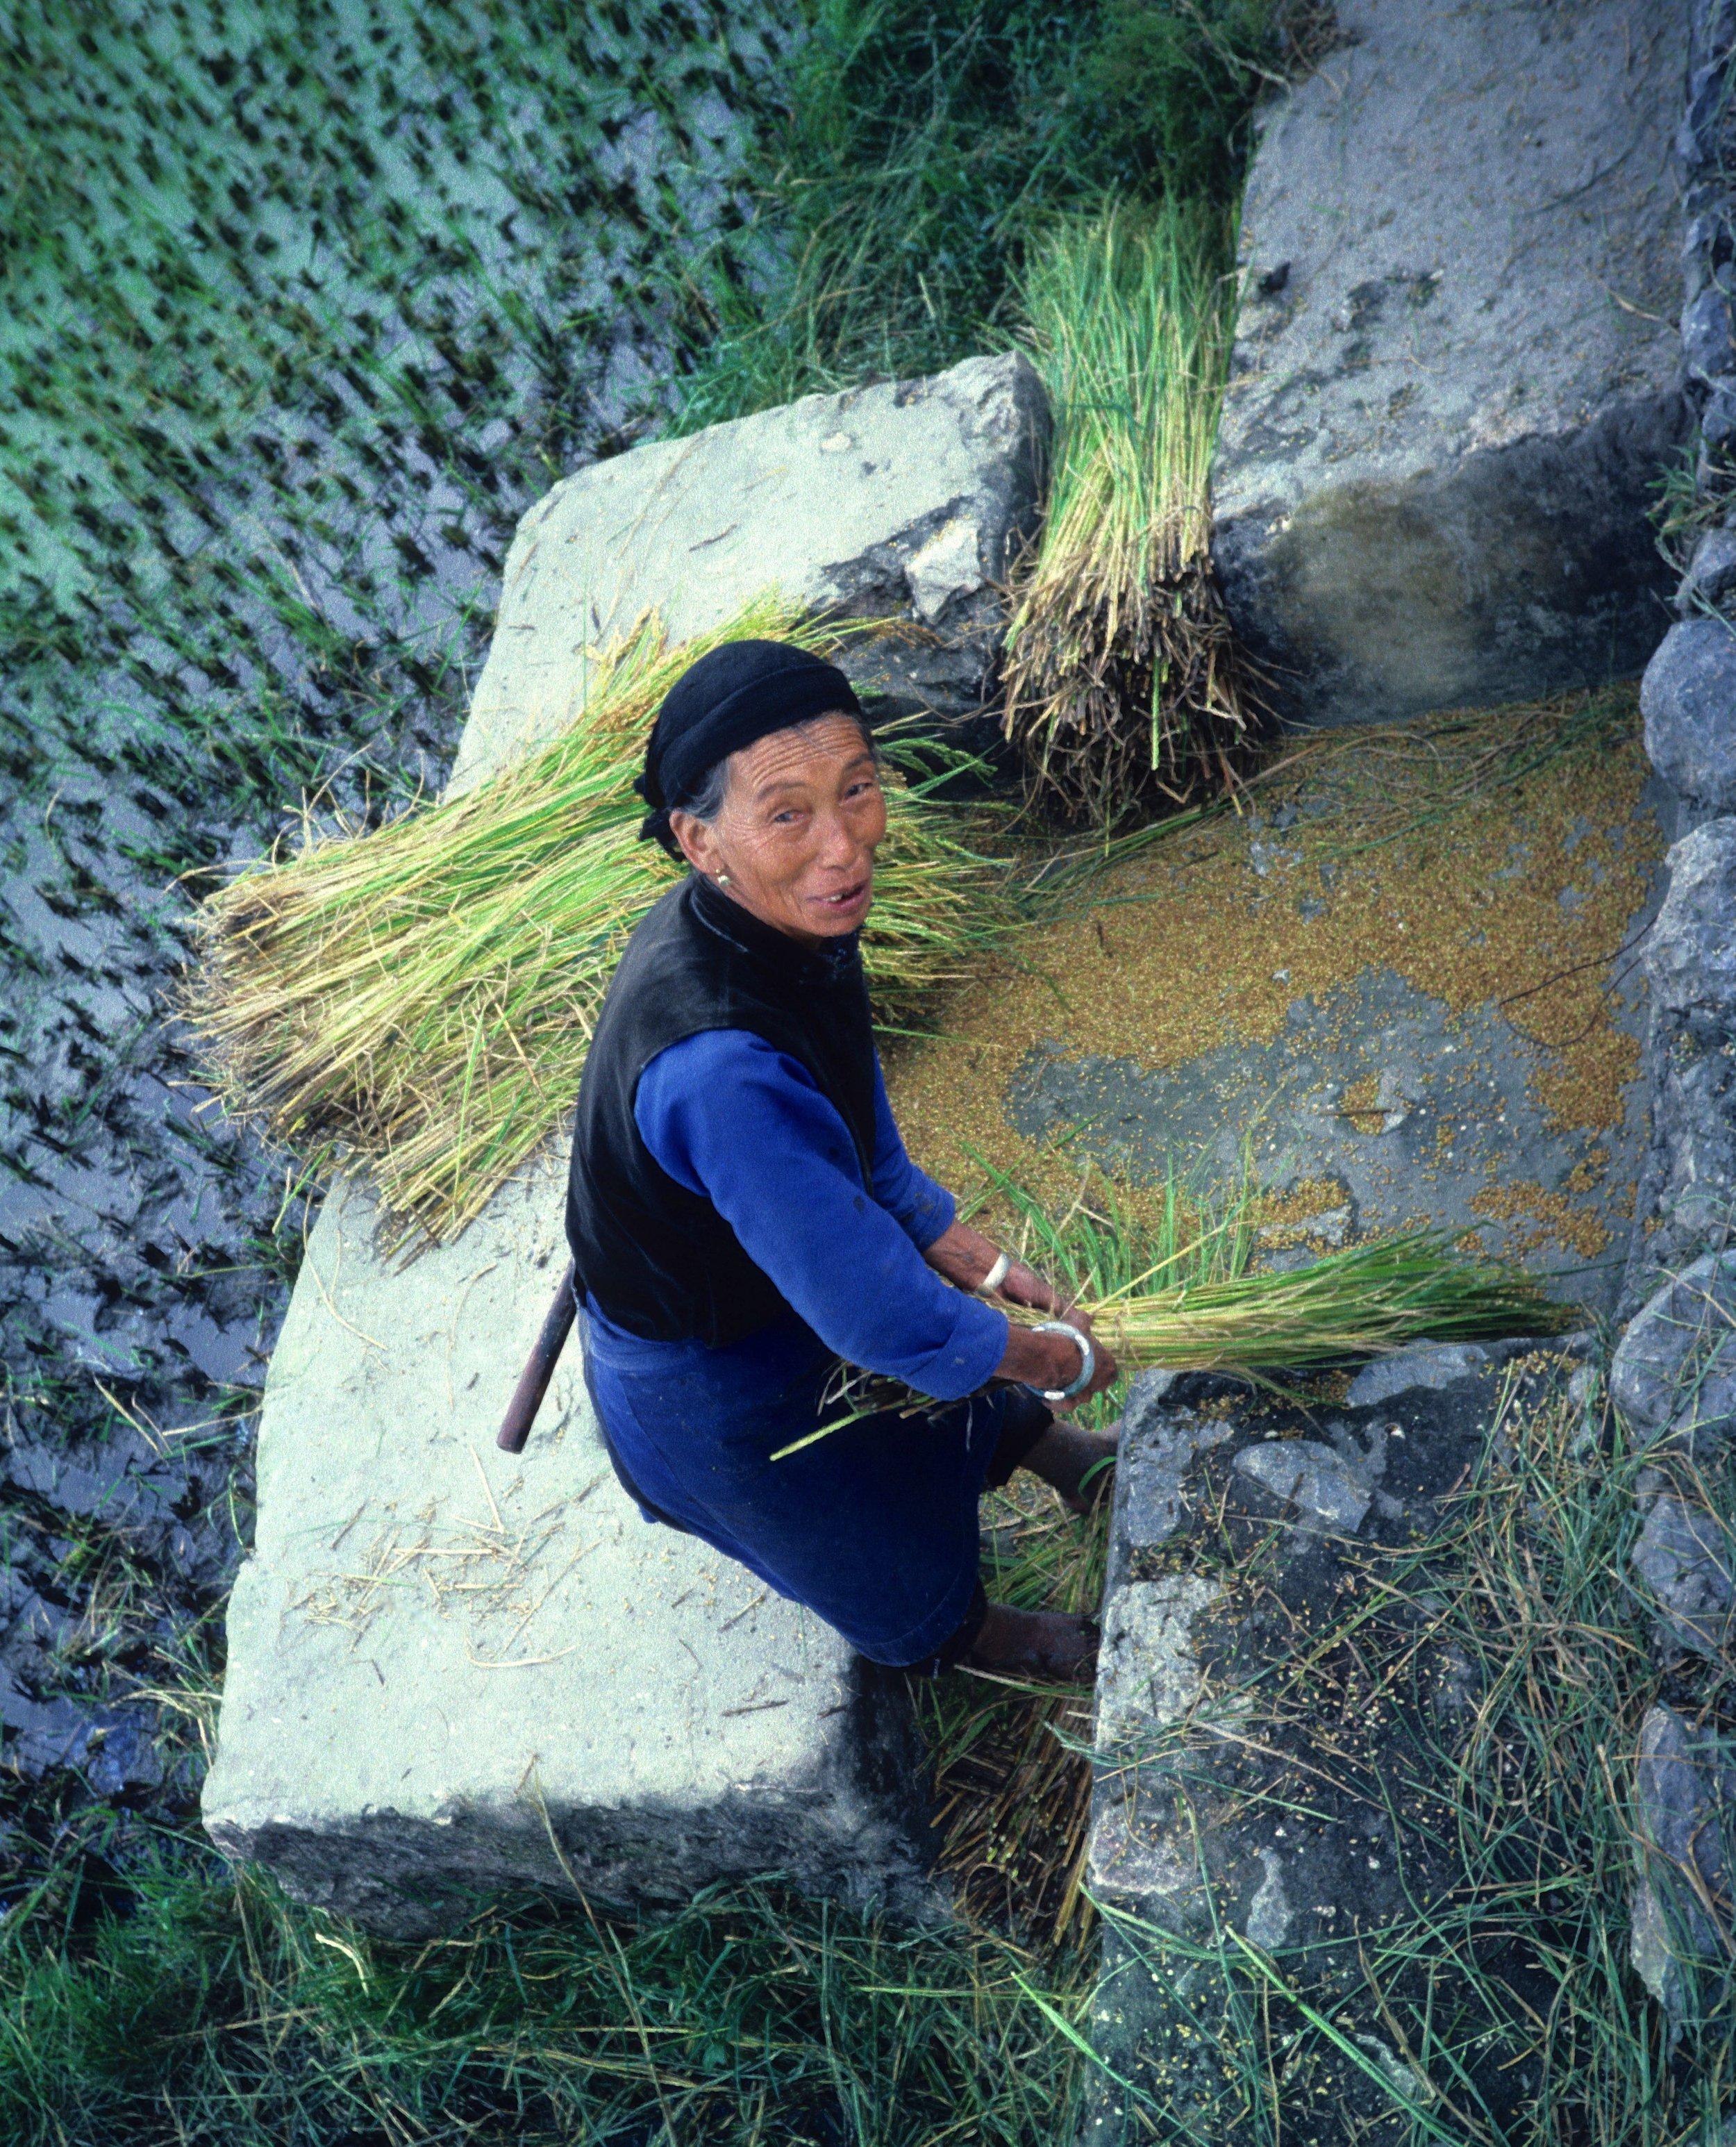 Harvesting rice, Dali (Kunming Province), China 1986